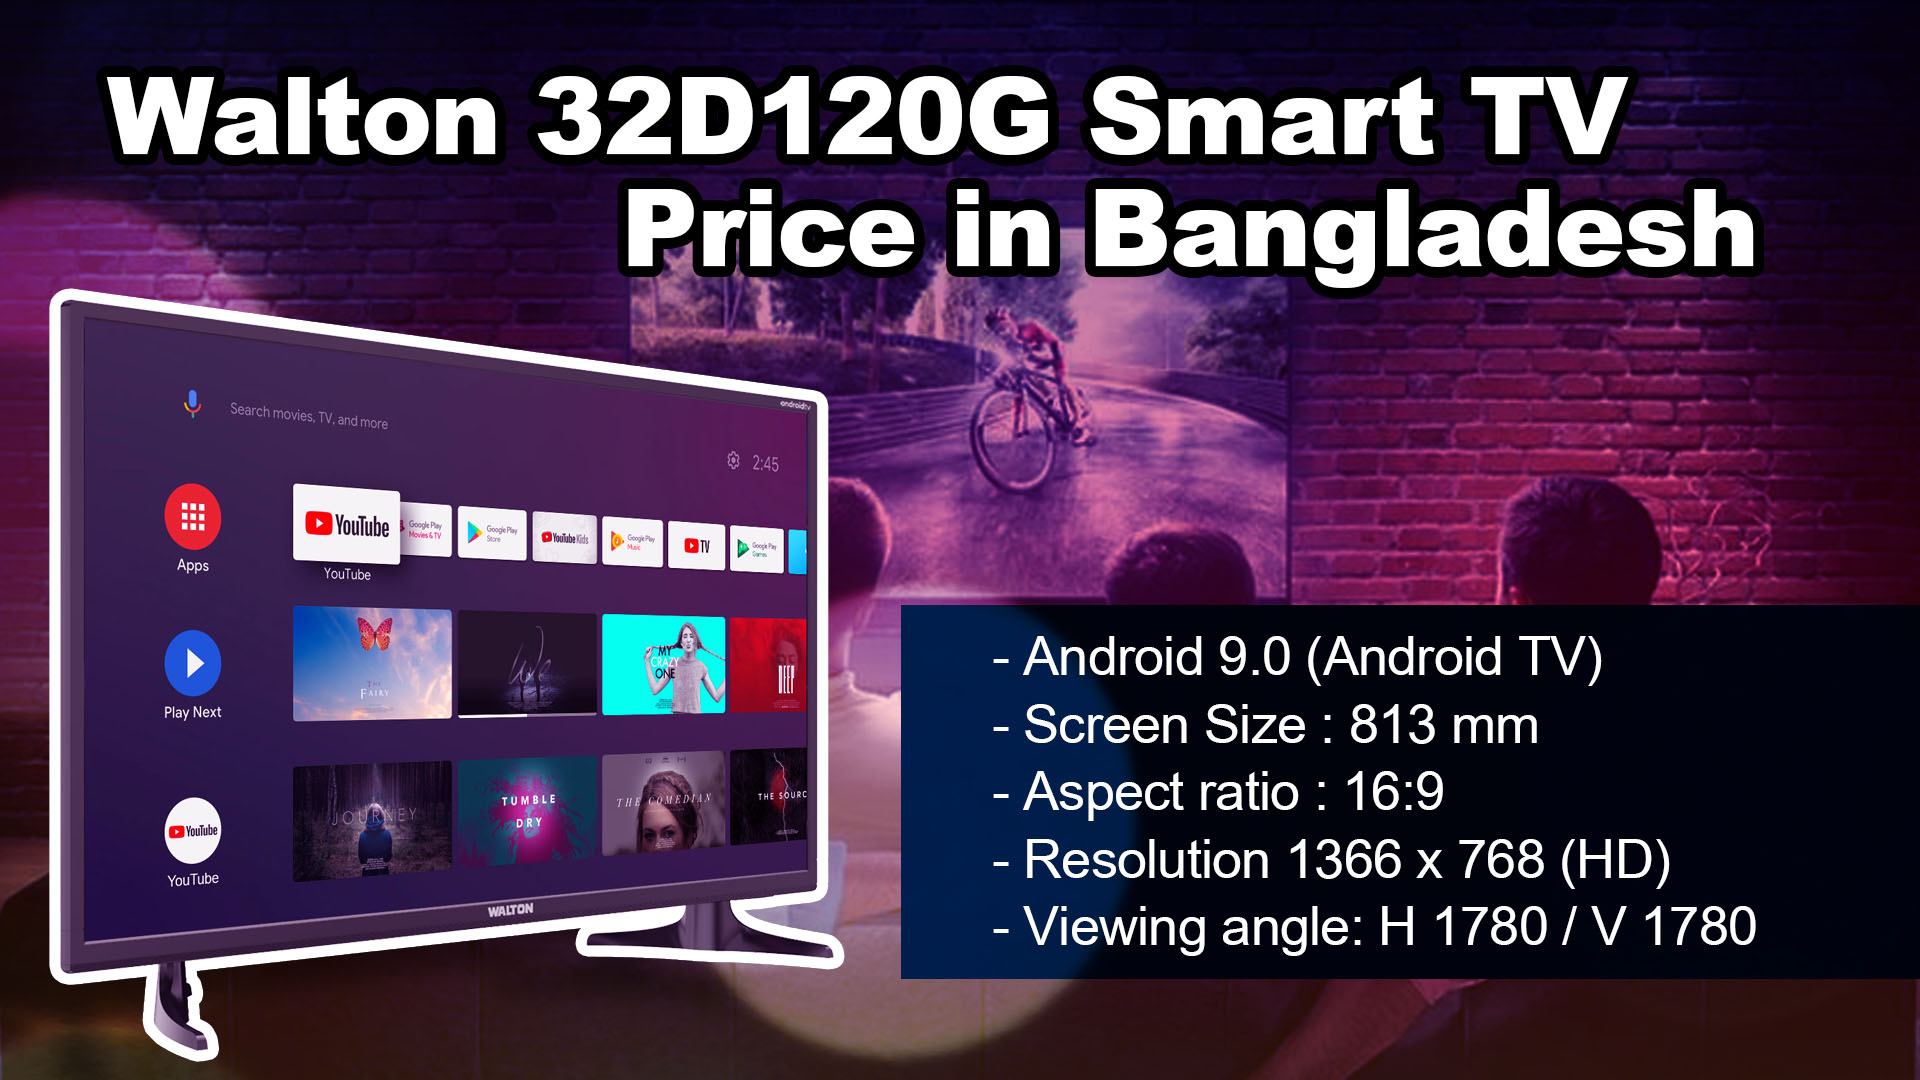 Walton 32D120G Smart TV price in BD